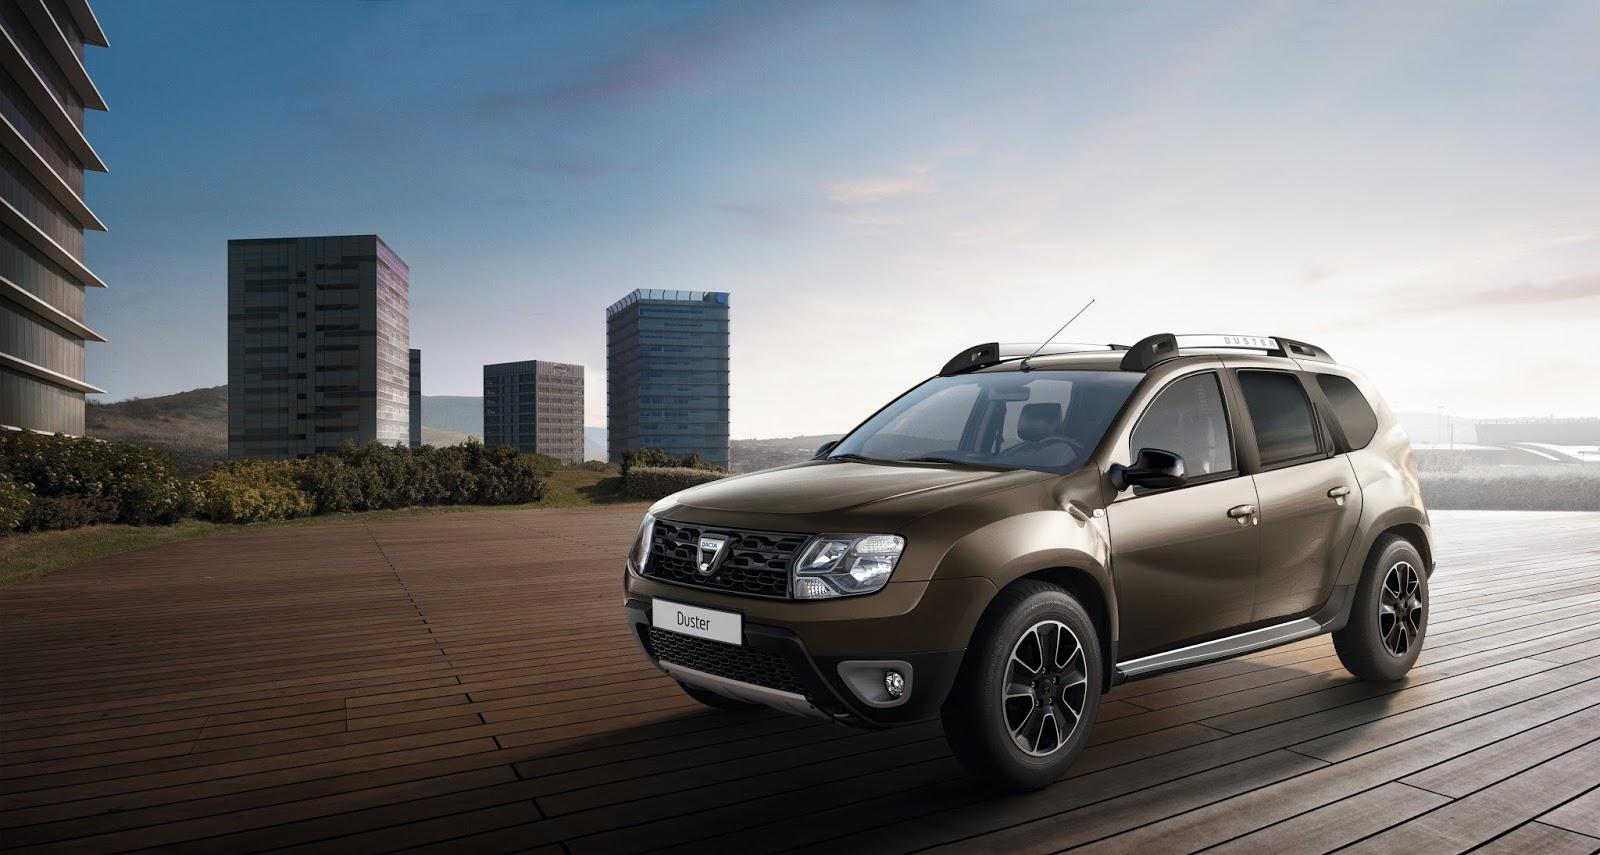 Dacia  Duster Restyling Motori | Gamma motorizzazioni Diesel e Benzina